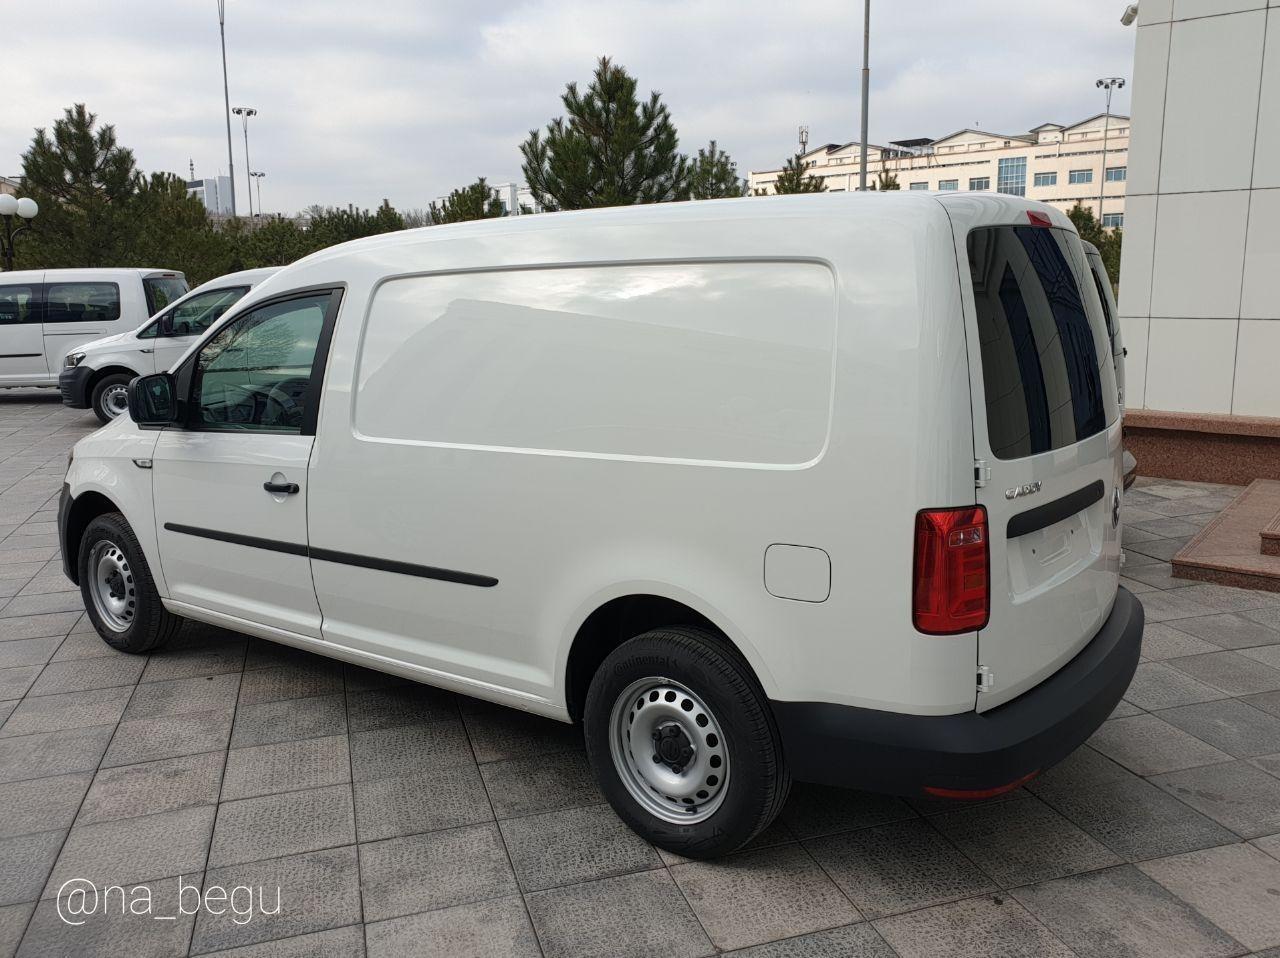 Volkswagen Caddy Narxi - Цена на Кэдди в Узбекистане - 8